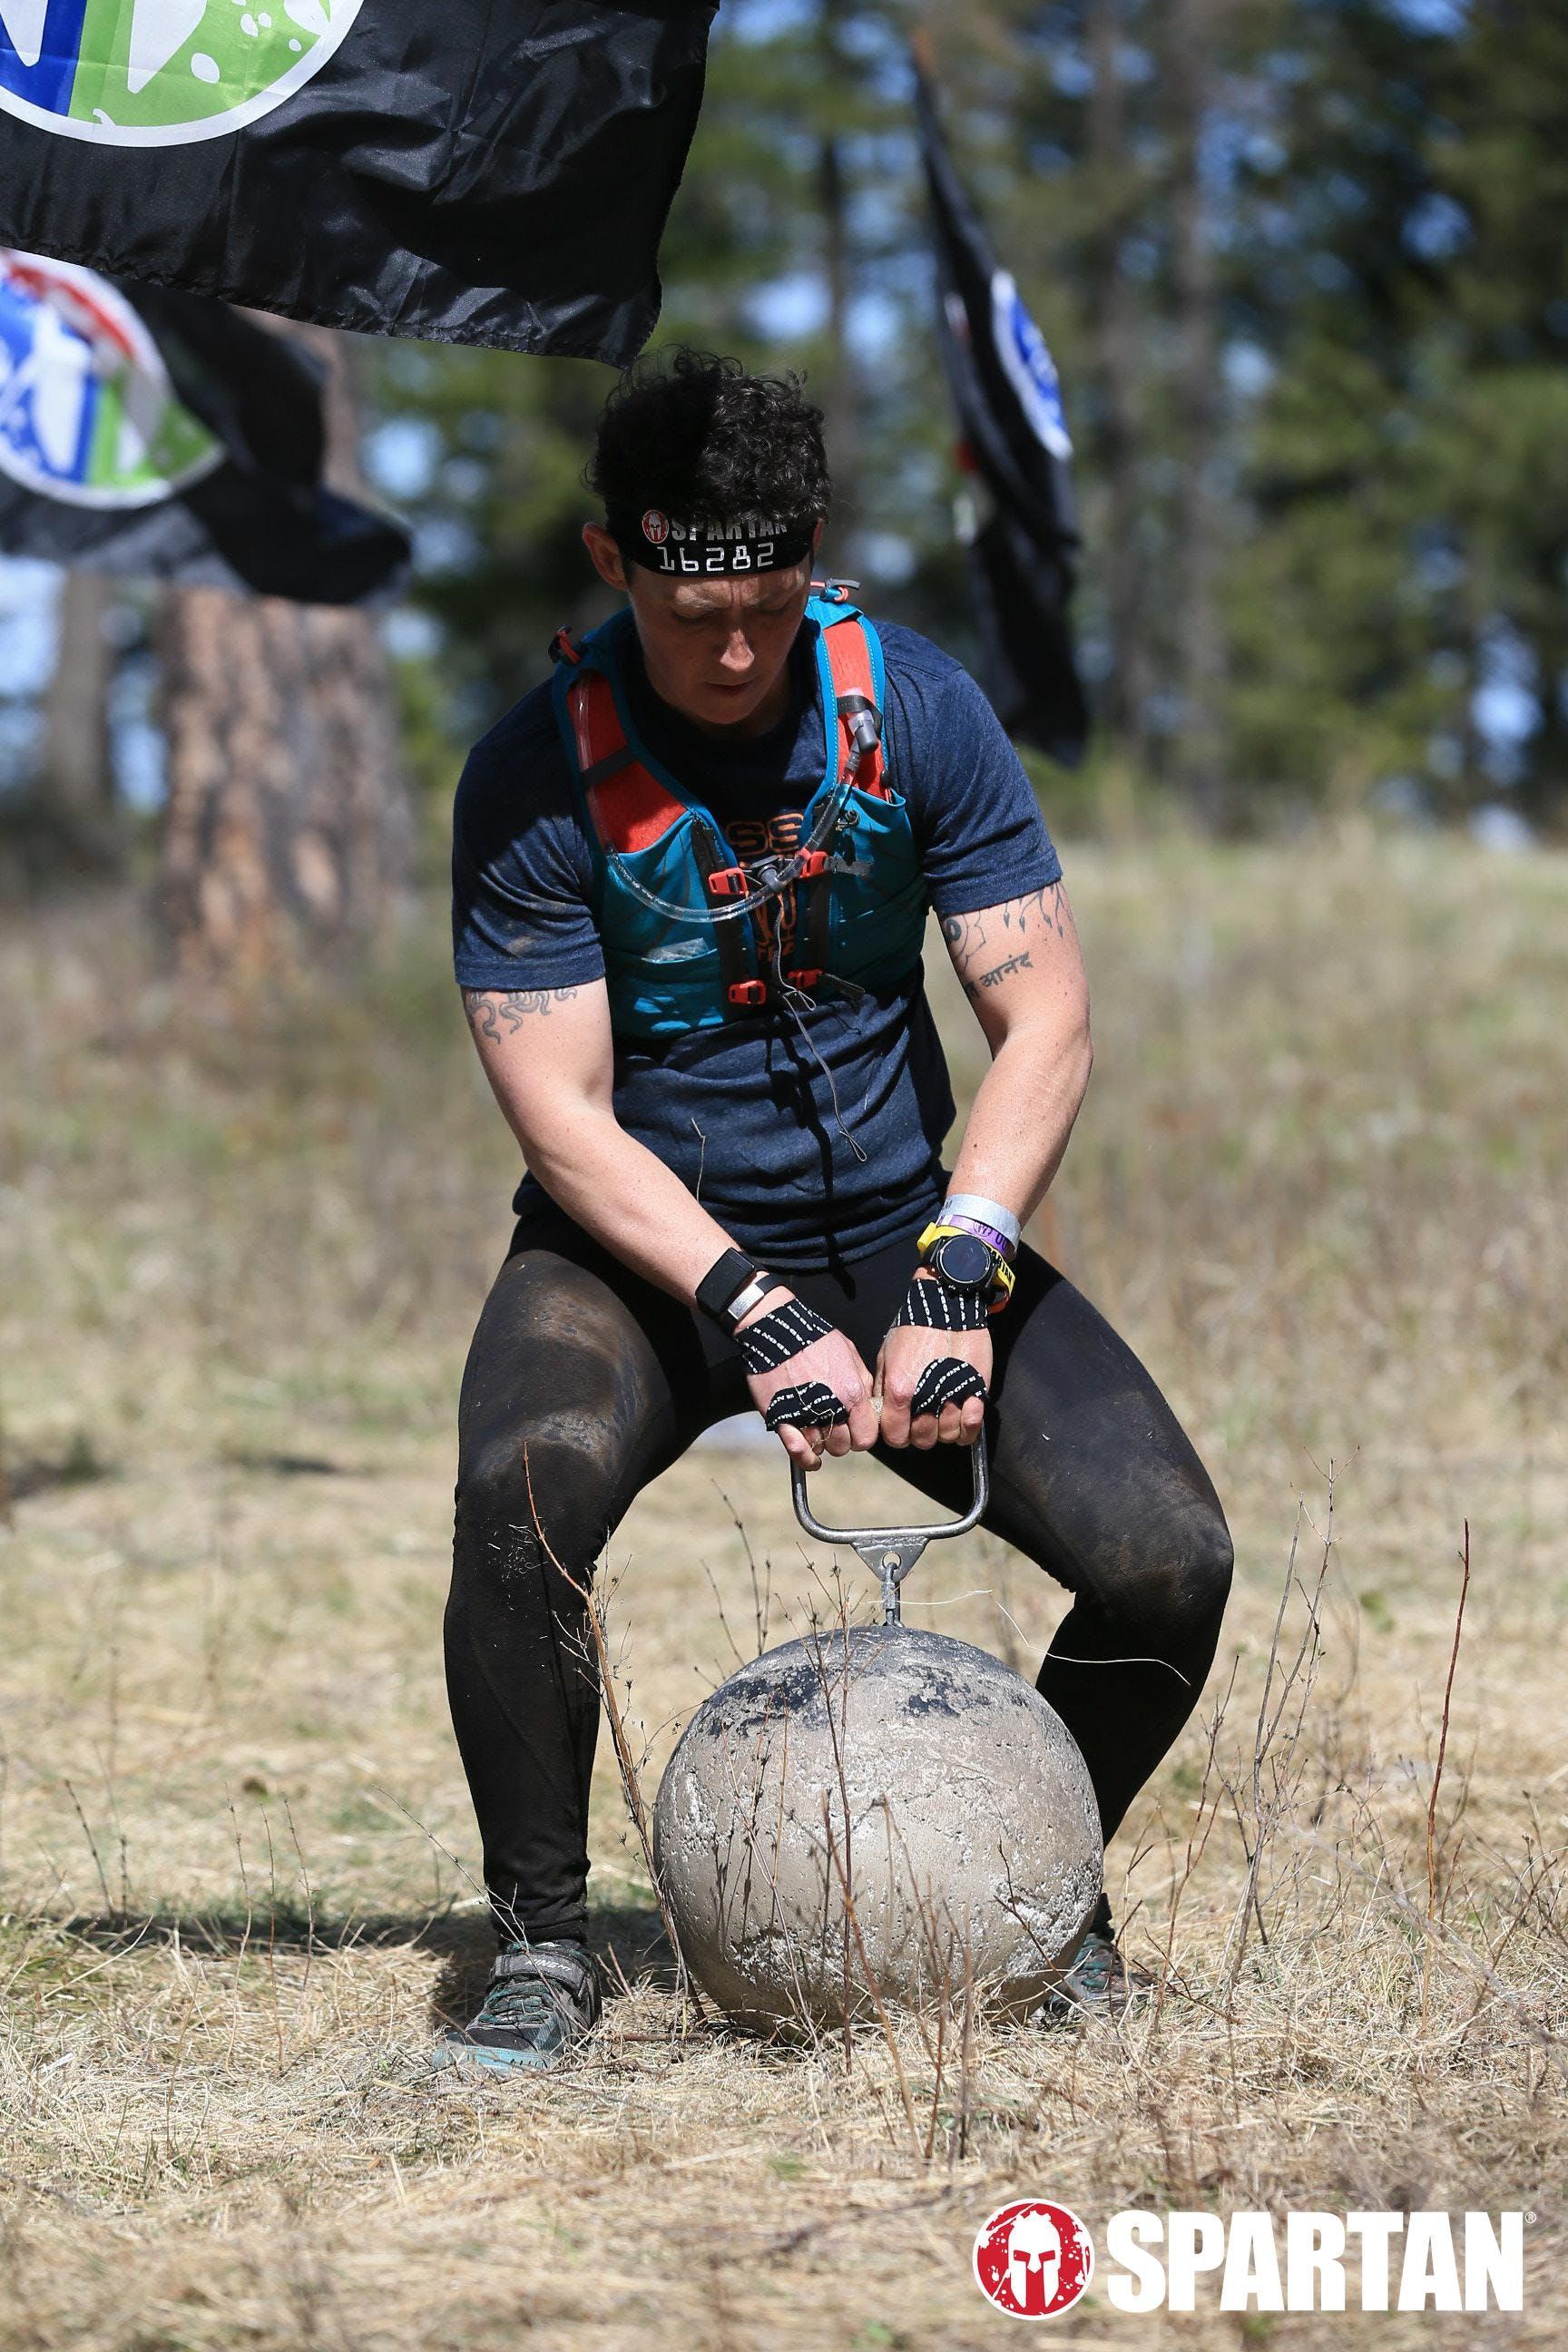 INL employees, Idaho national laboratory employees, idaho spartan race, spartan race